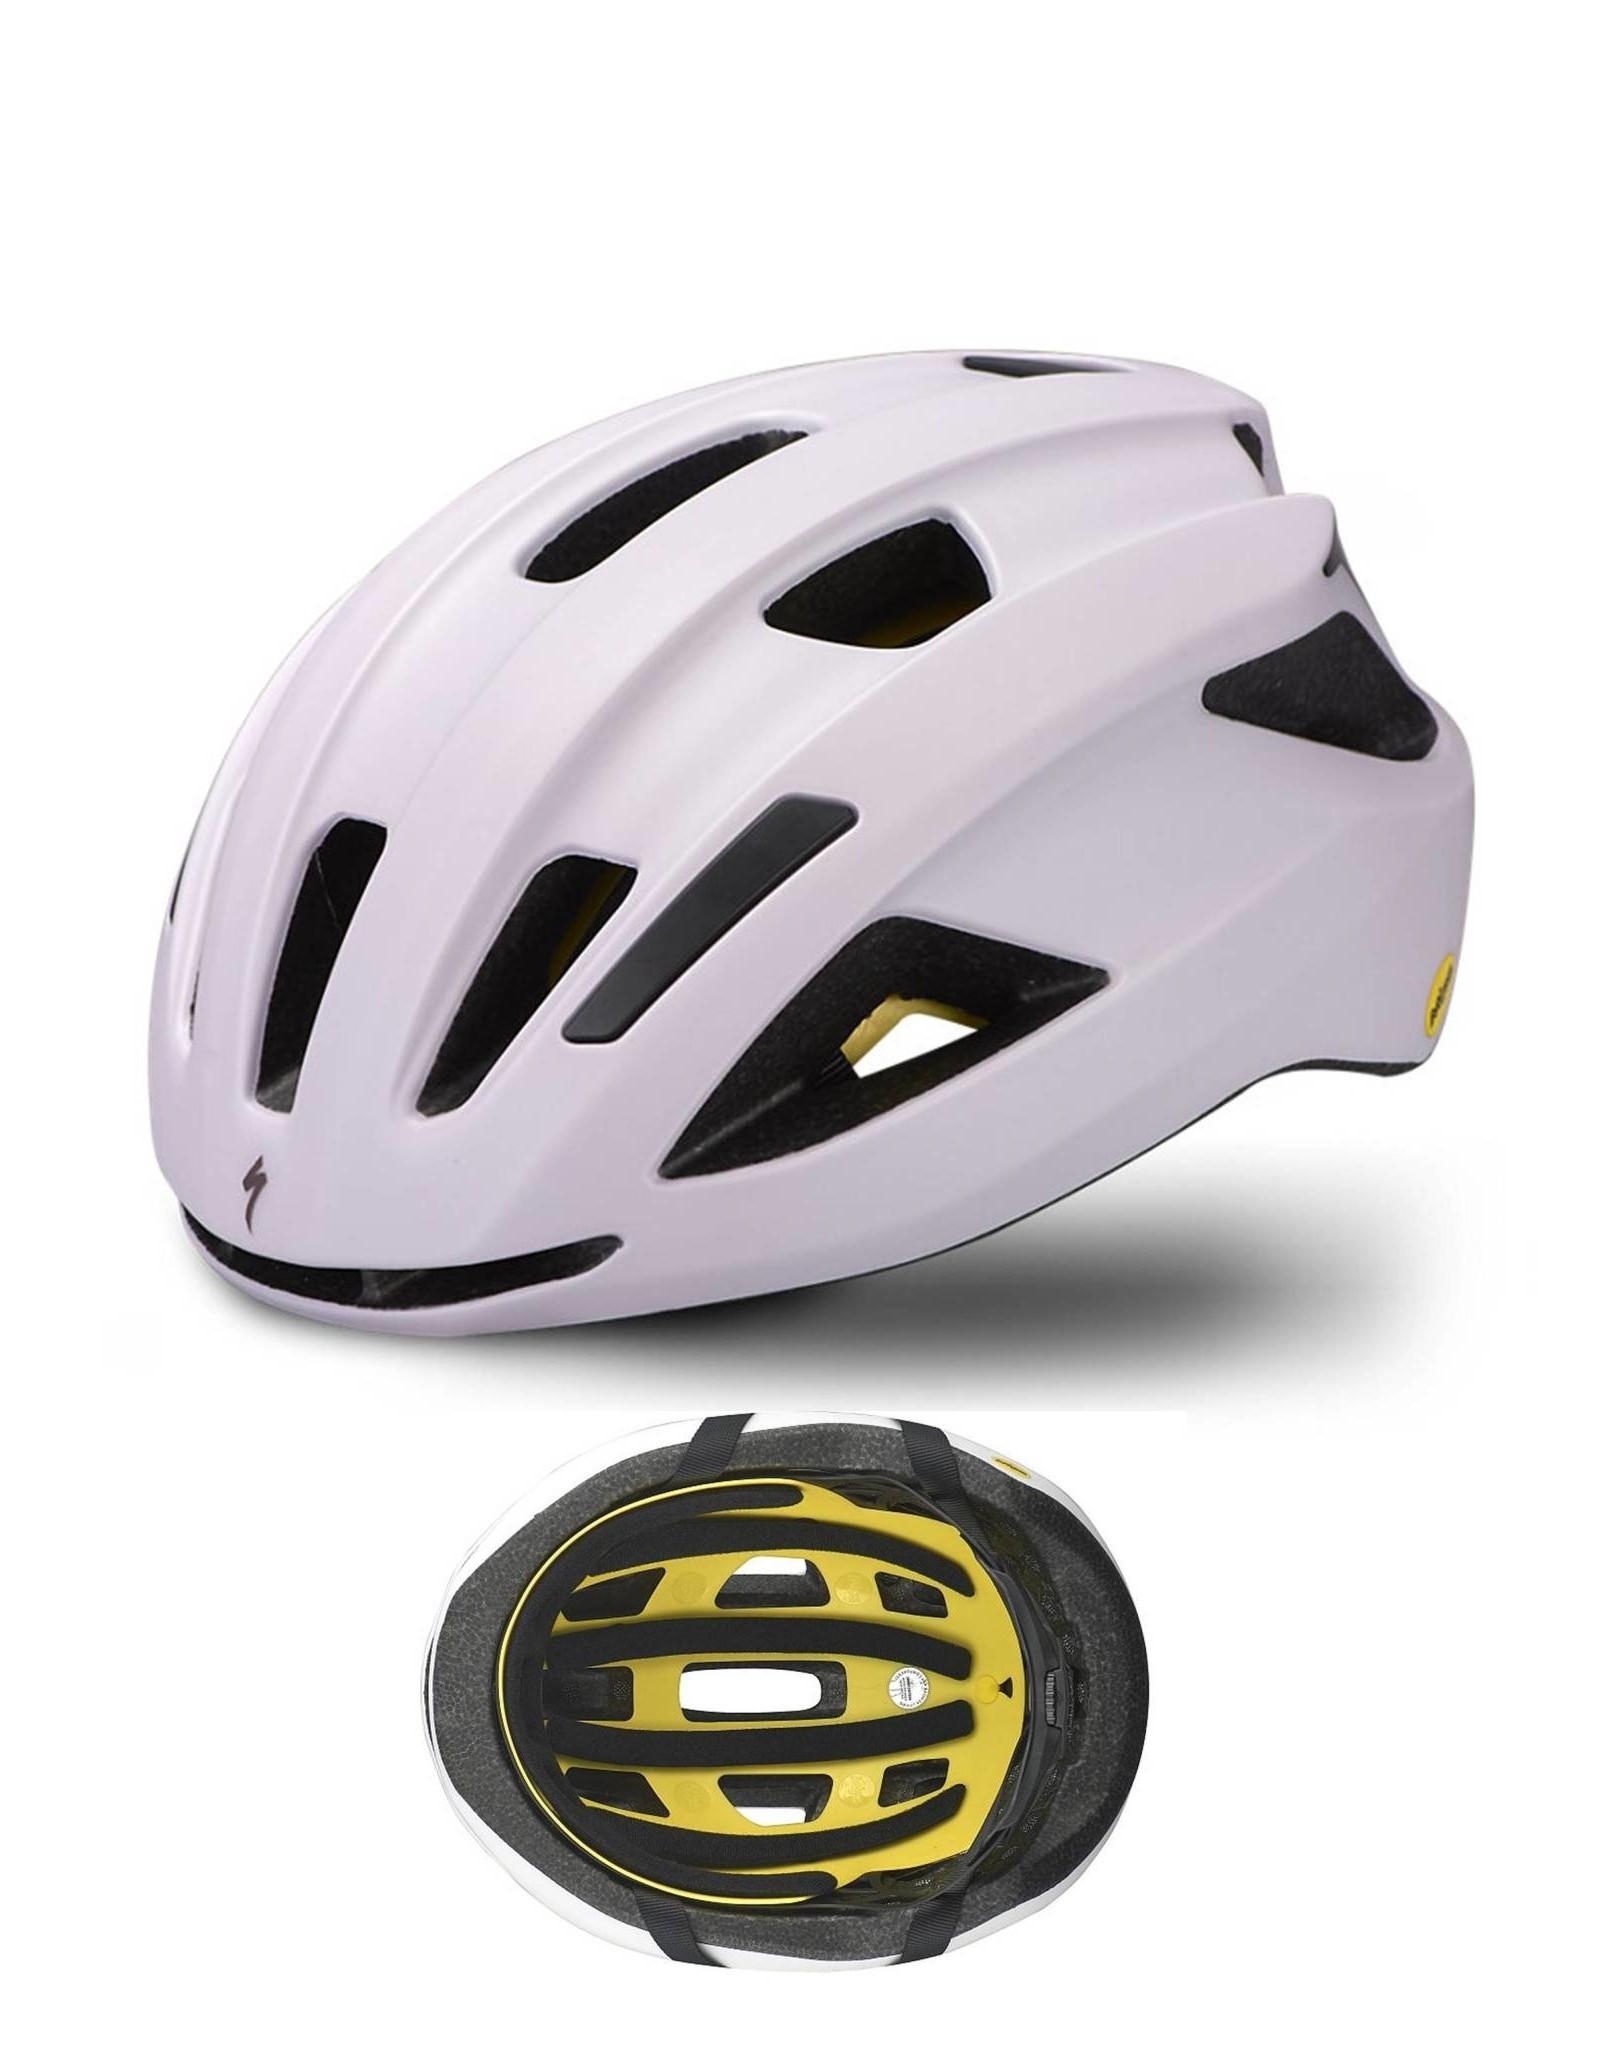 SPECIALIZED Specialized Align MIPS II Helmet Satin Clay/Satin Cast Umber